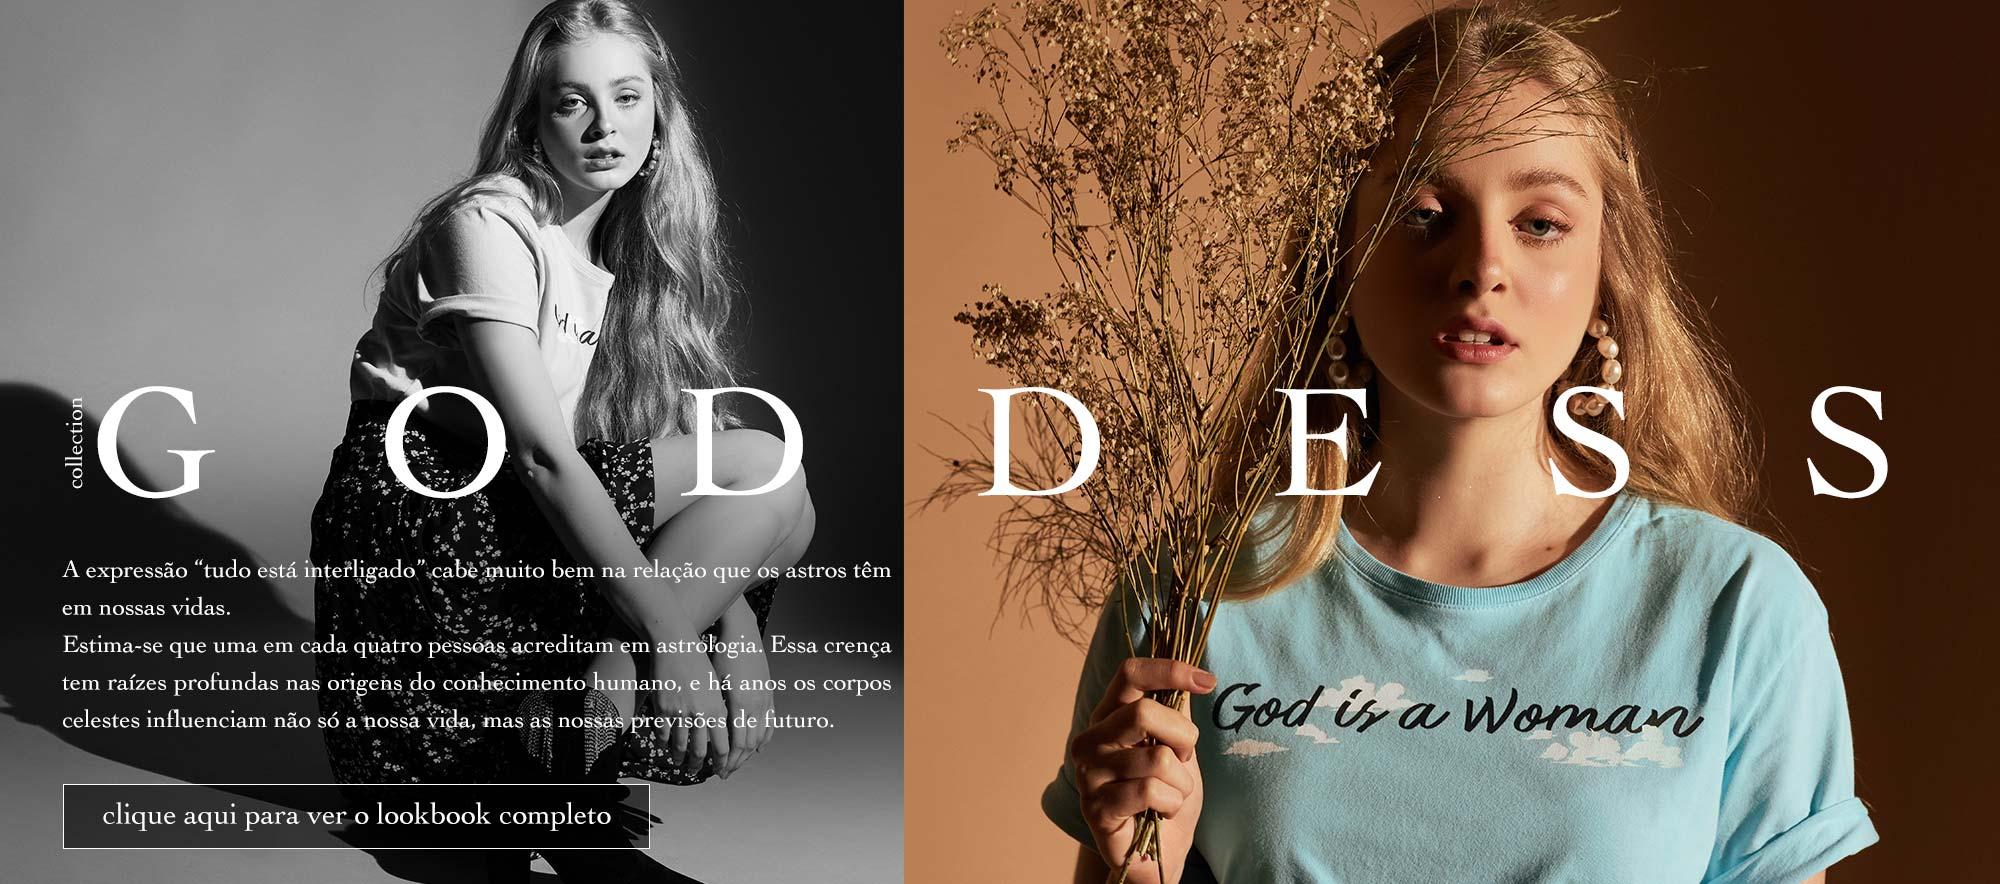 Nova Coleção Ziovara Goddess Lookbook